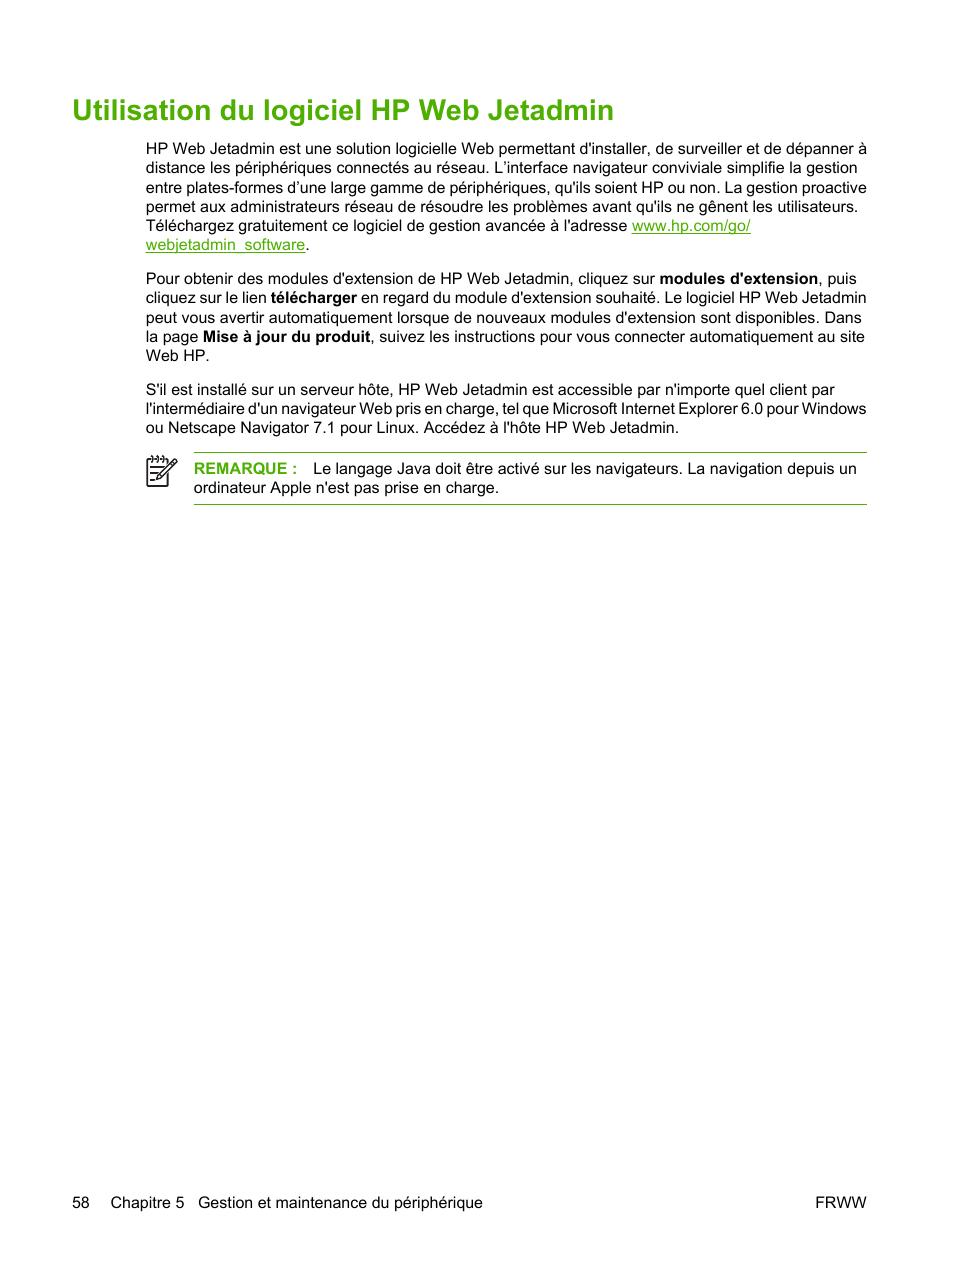 Utilisation du logiciel hp web jetadmin | HP Digital Sender